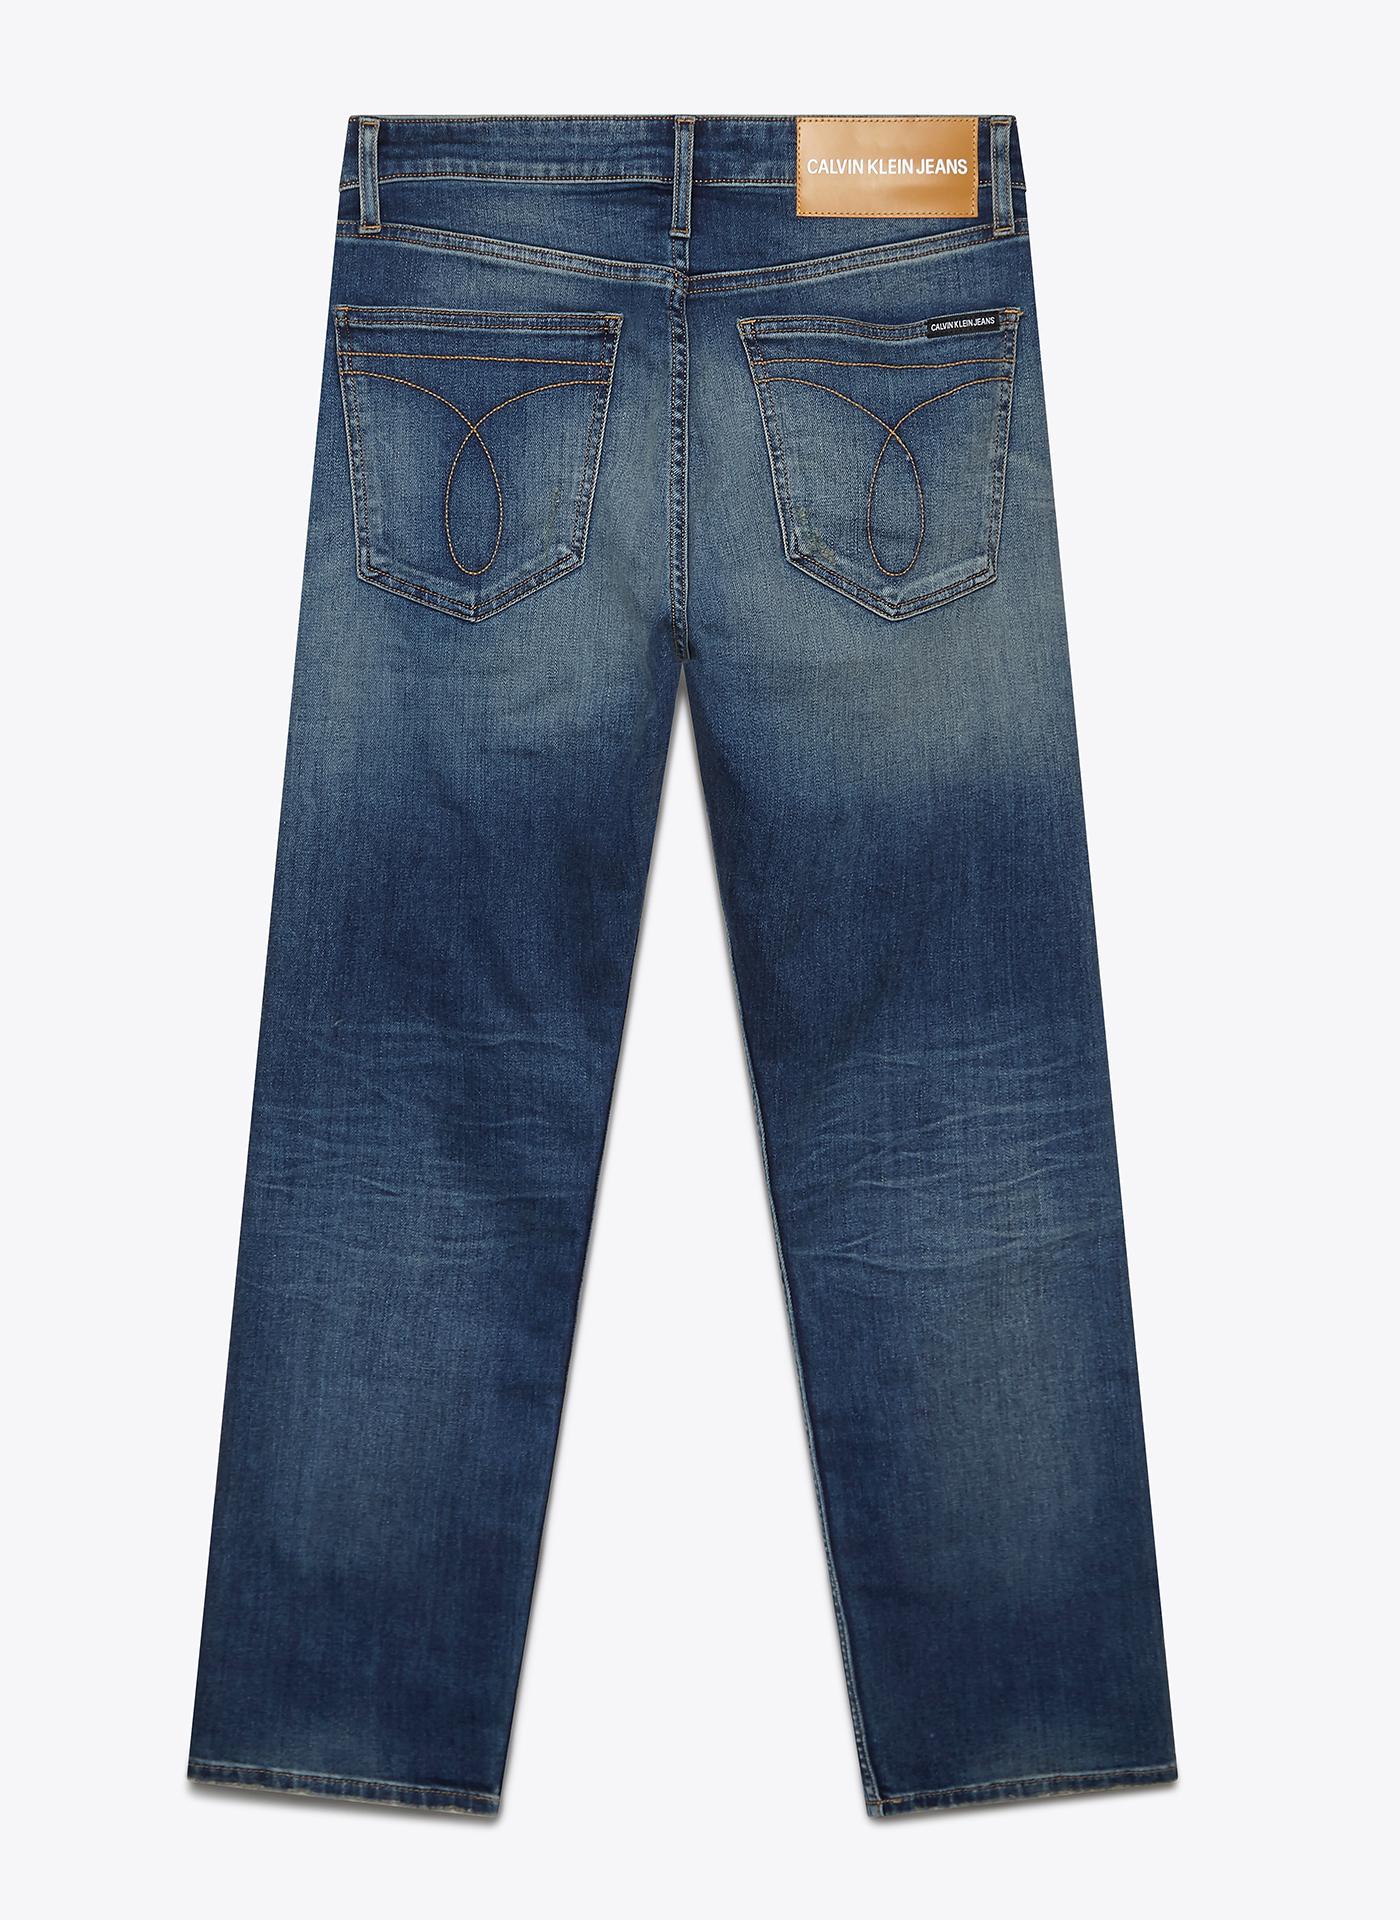 blue denim jeans back on white background